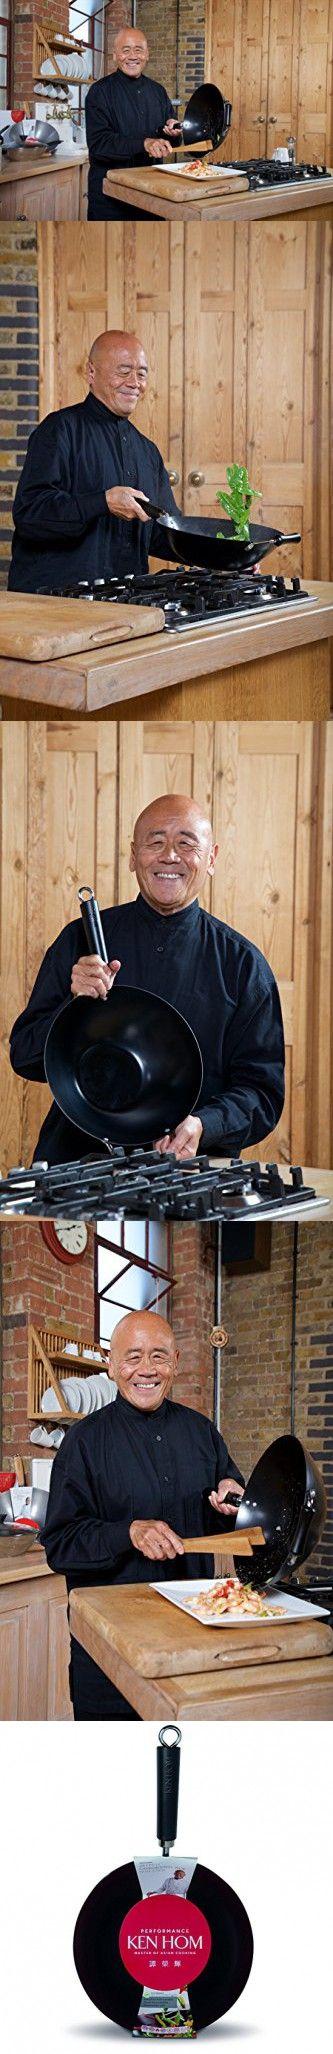 "KEN HOM Nonstick Carbon Steel Wok - Flat Bottom Asian Stir Fry Pan with Handle - 11"", Black"